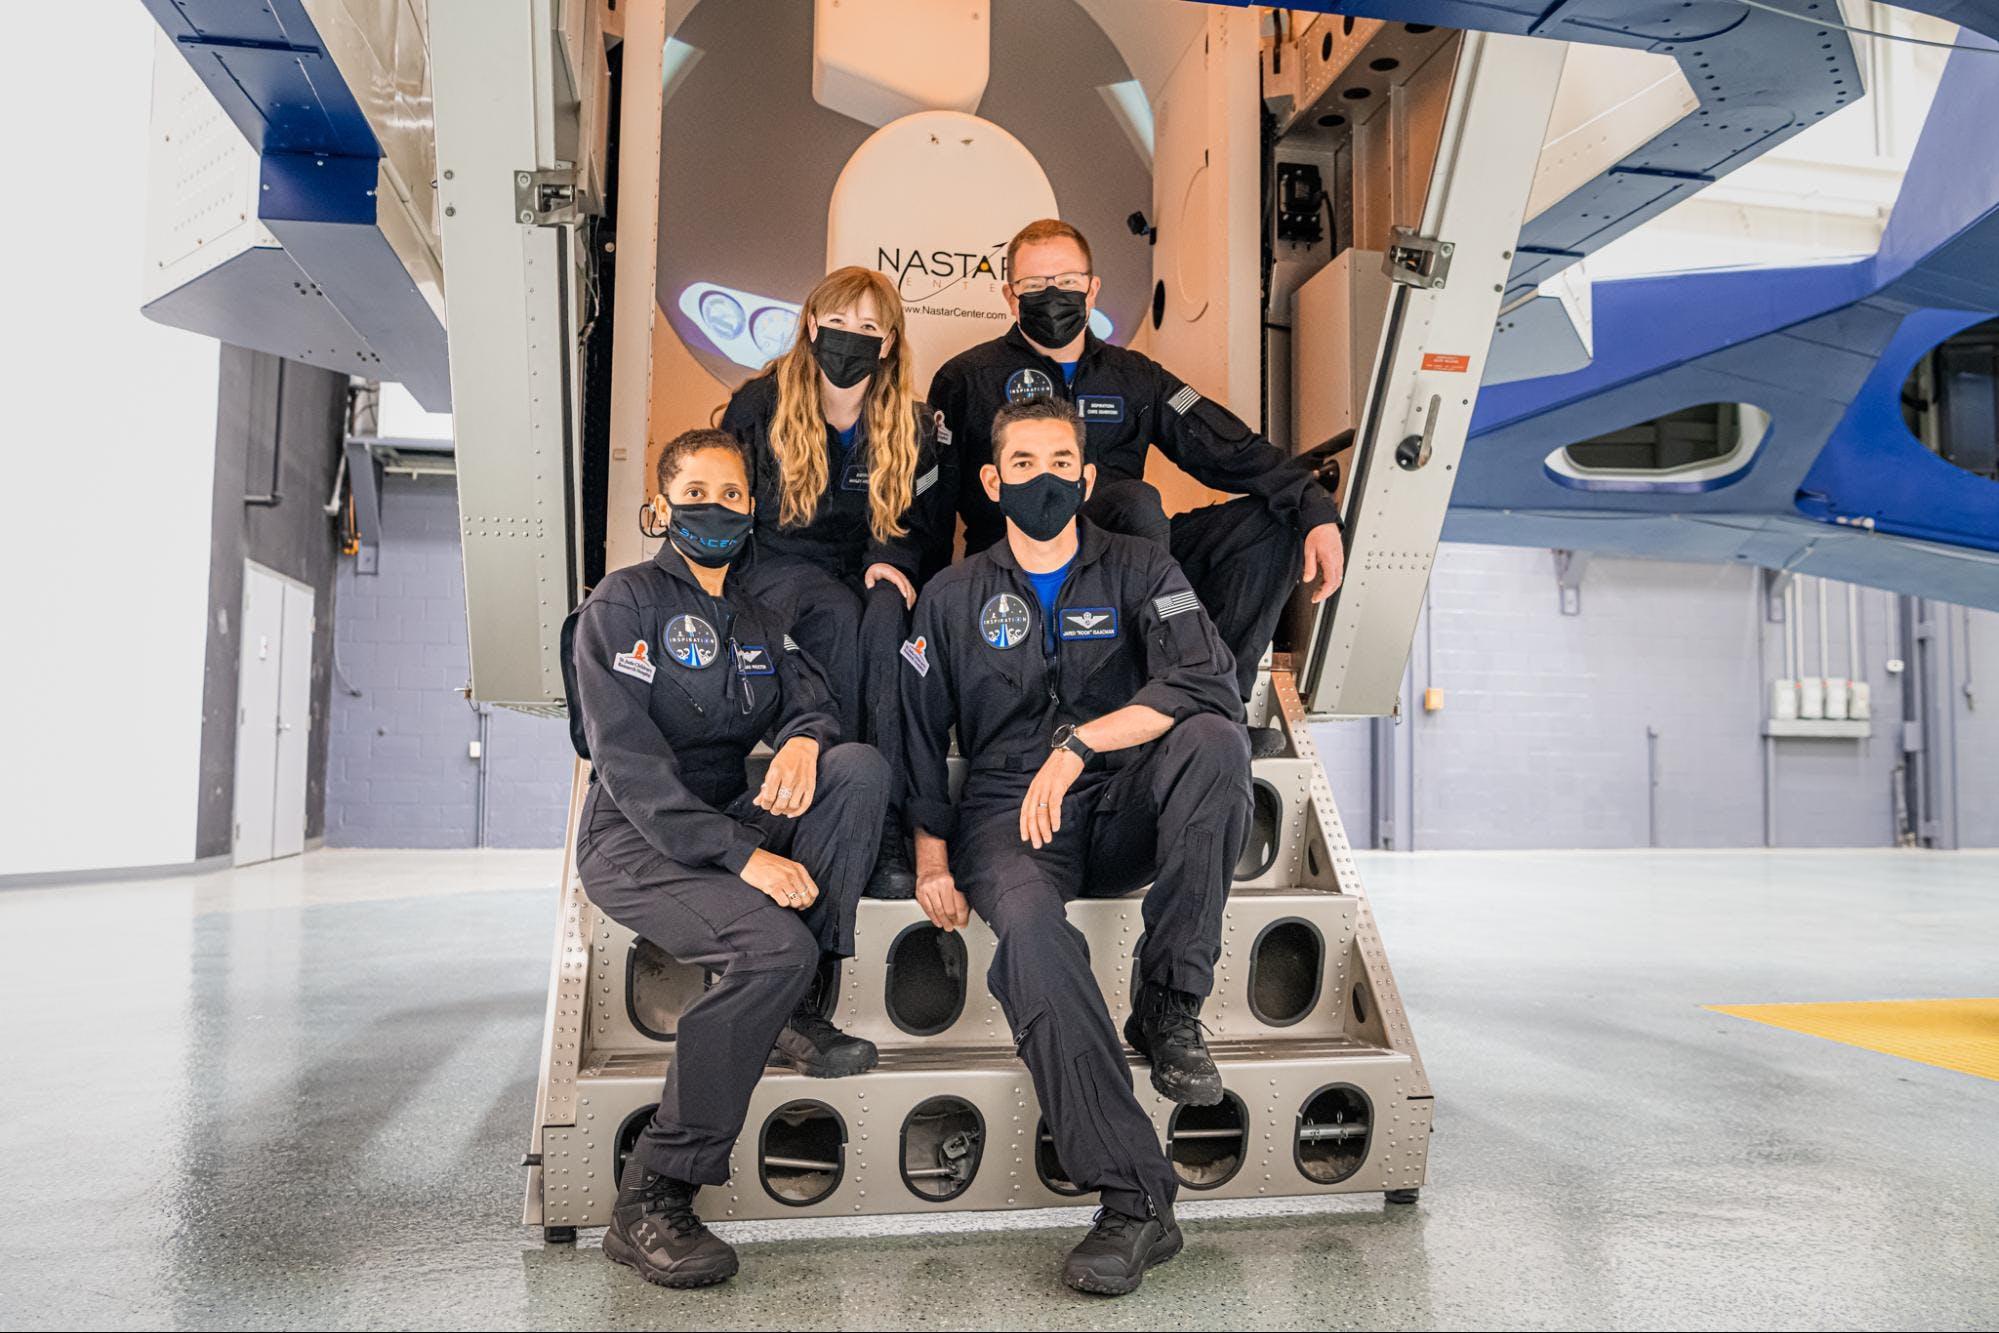 Inspiration4 crew completes centrifuge training